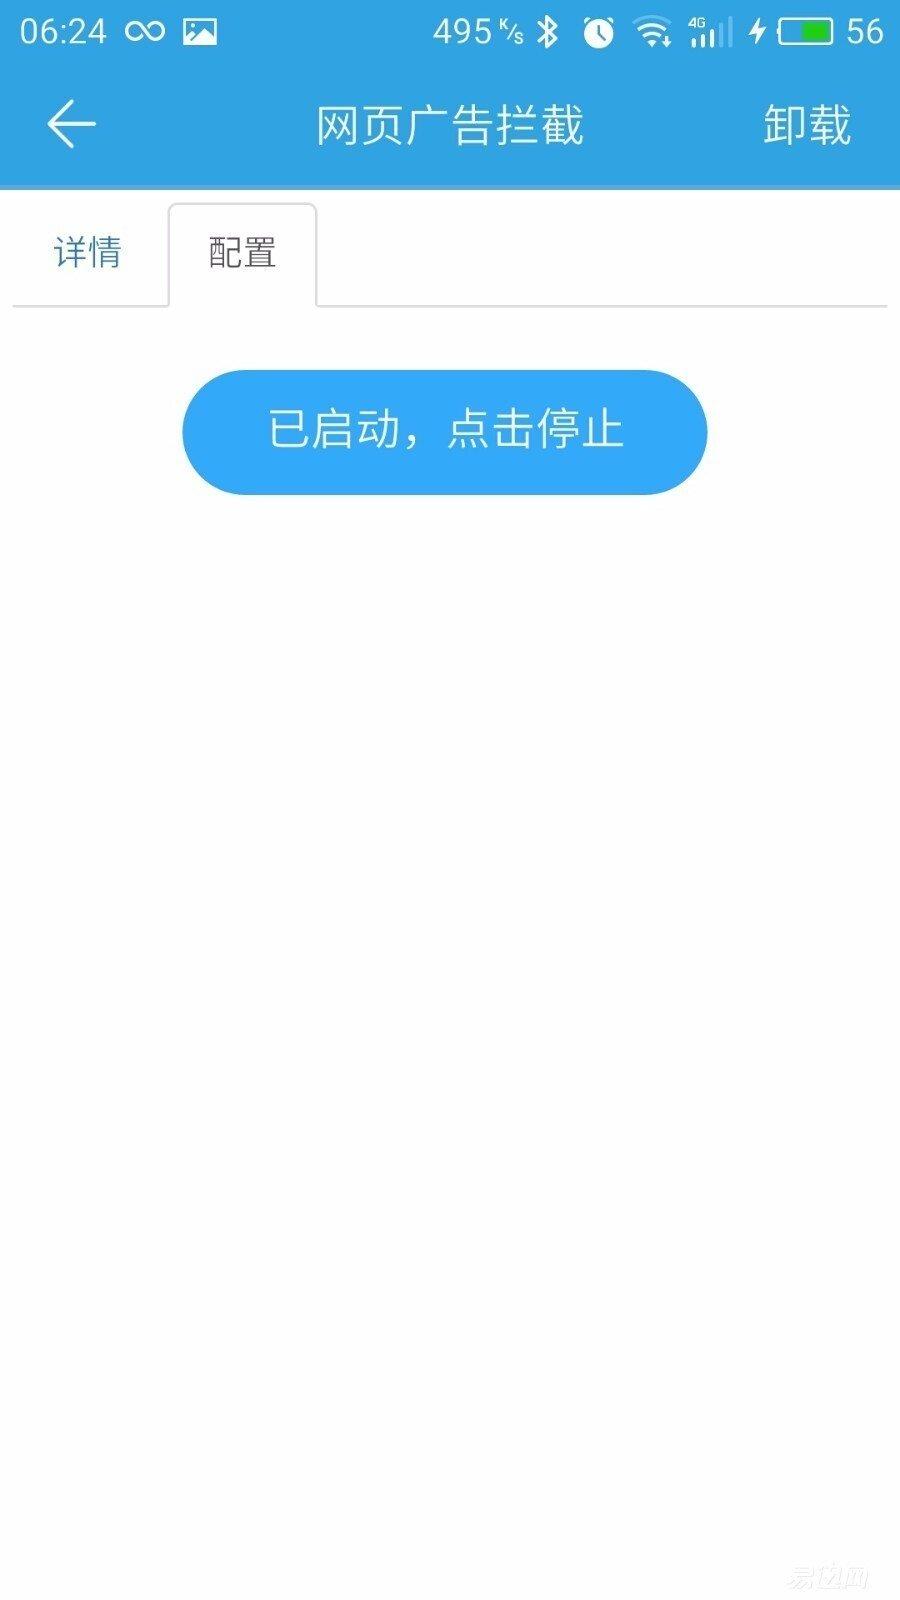 579f5894N44b21b62.jpg